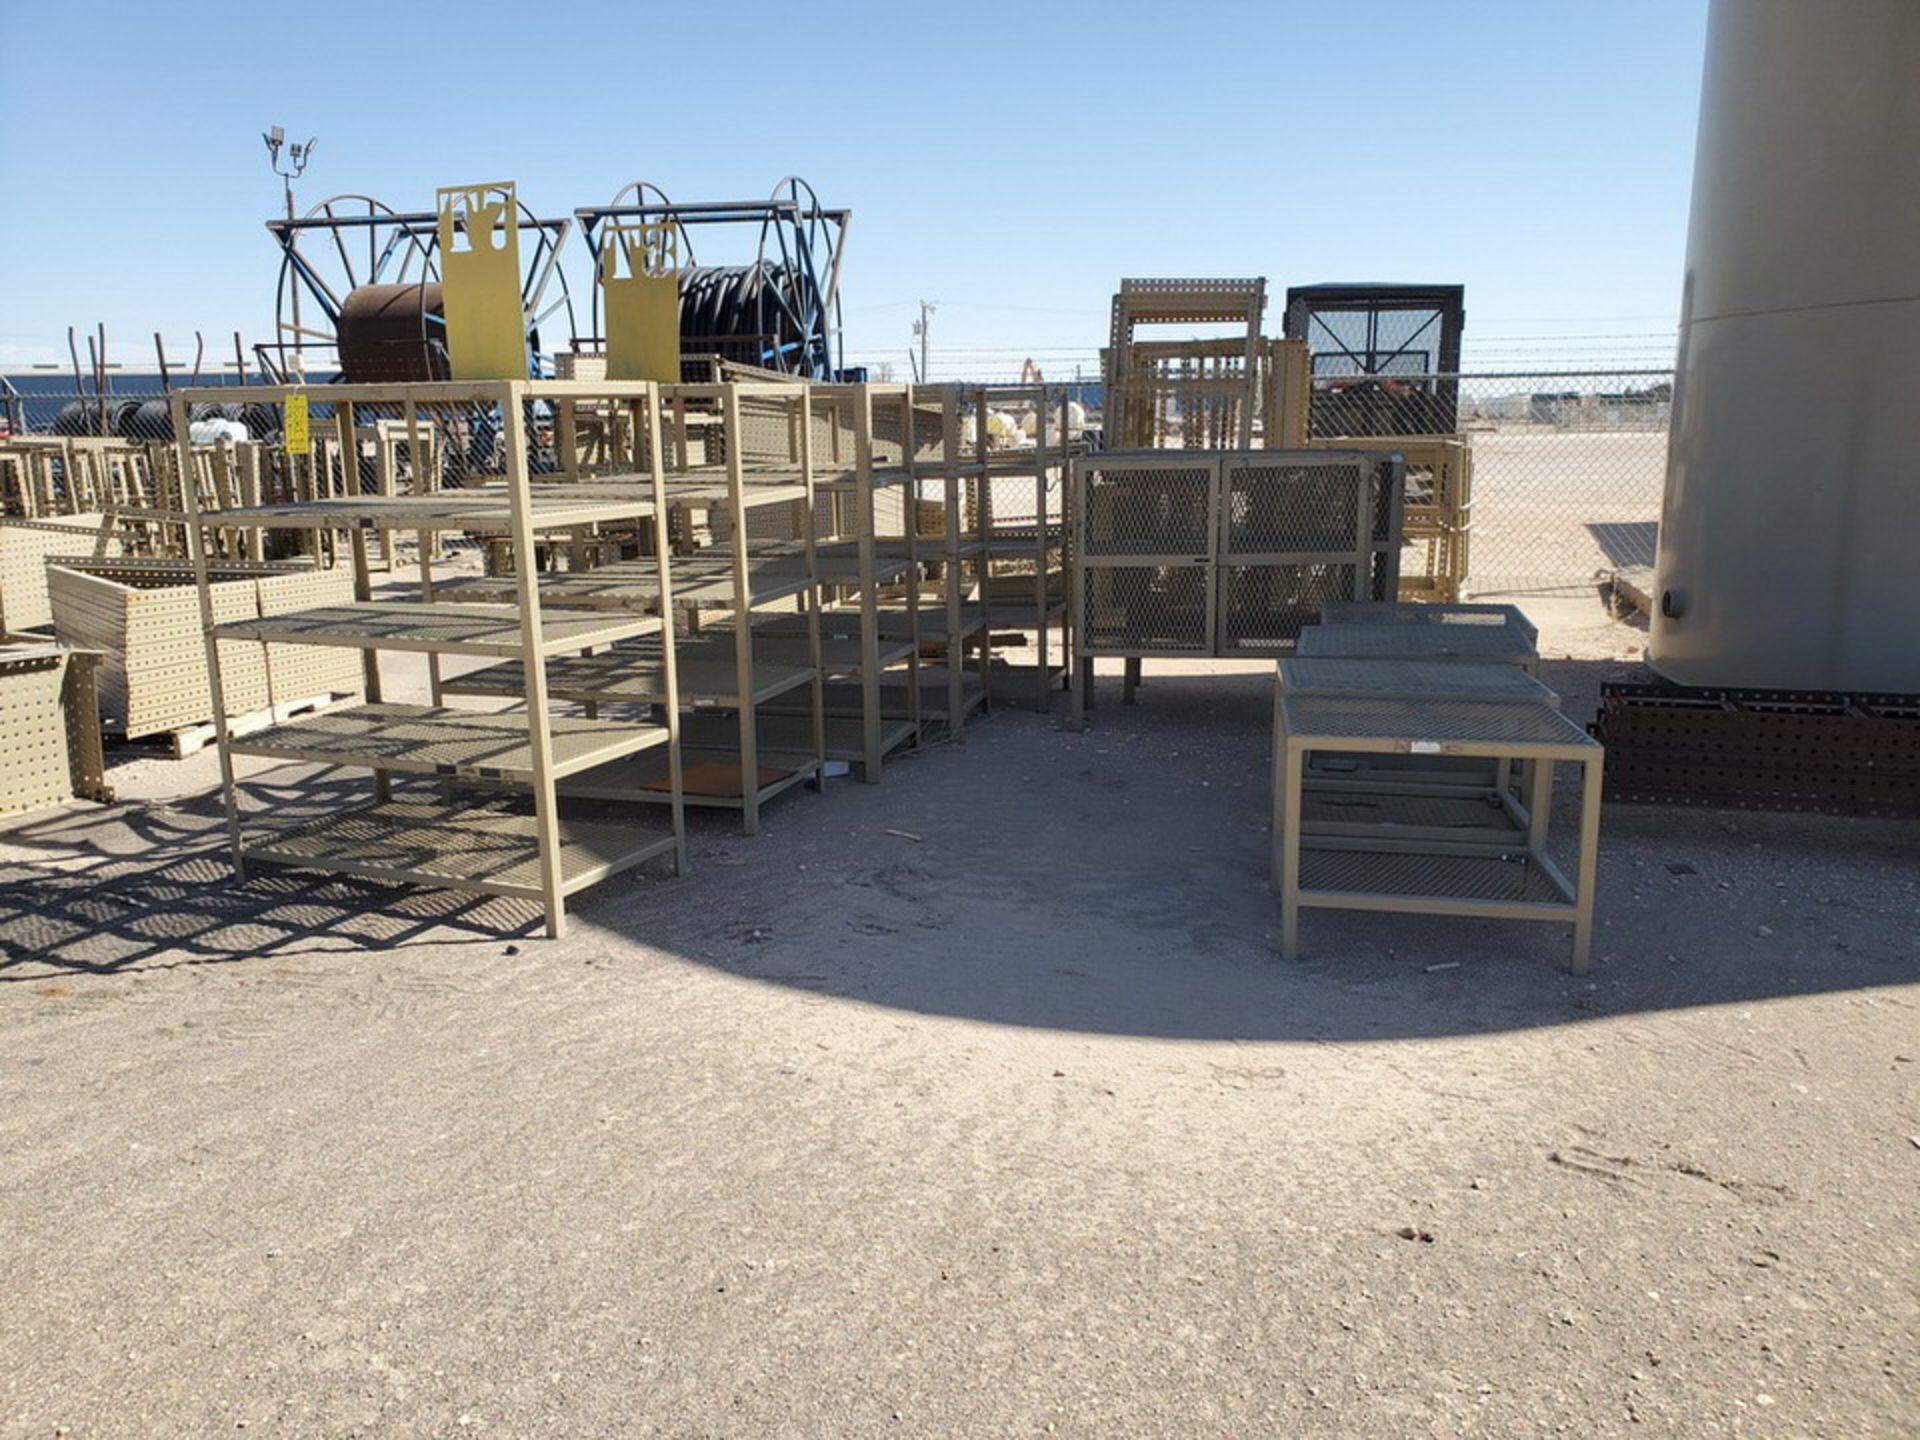 "Assorted Stl Matl. Racks & Ladders Size Range: 30"" x 26"" x 25""H - 29"" x 48"" x 50""H - Image 16 of 18"